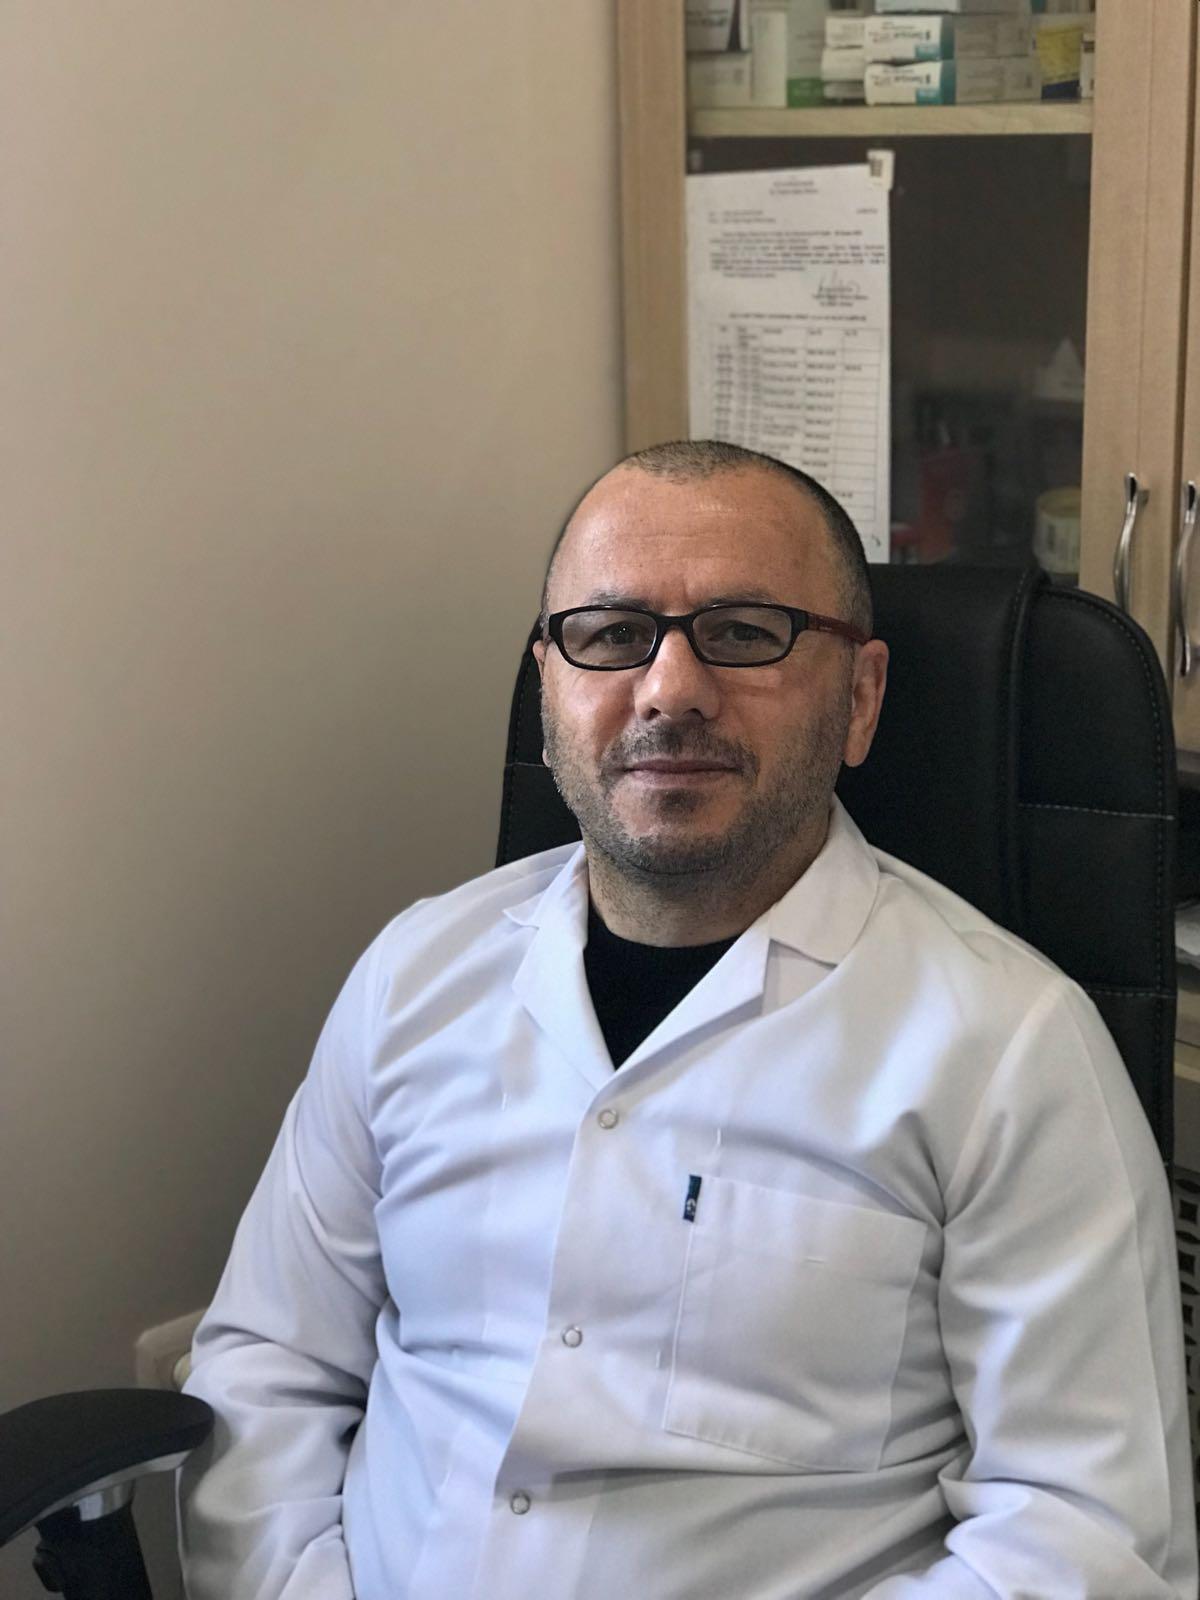 Dr Abidin Erkuş